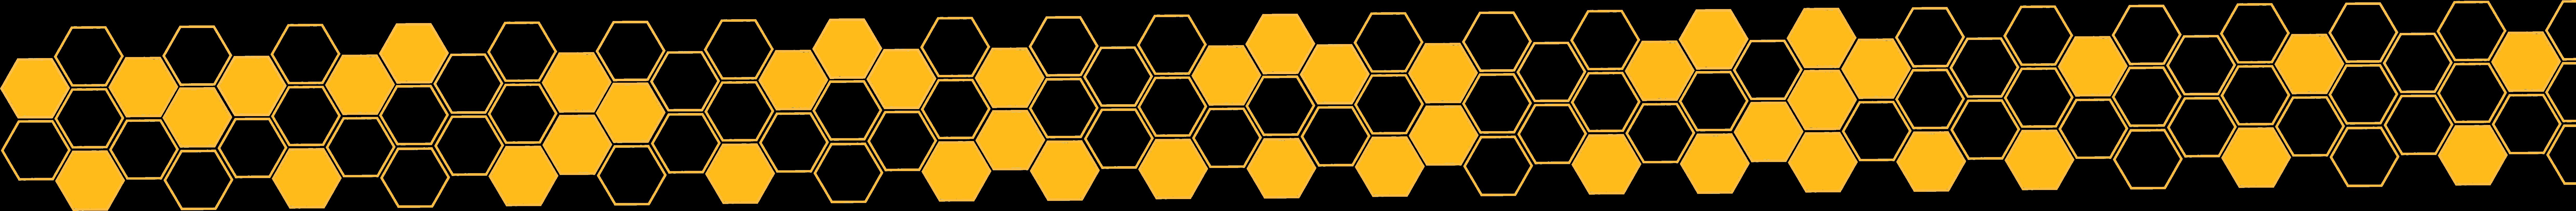 long yellow honeycomb